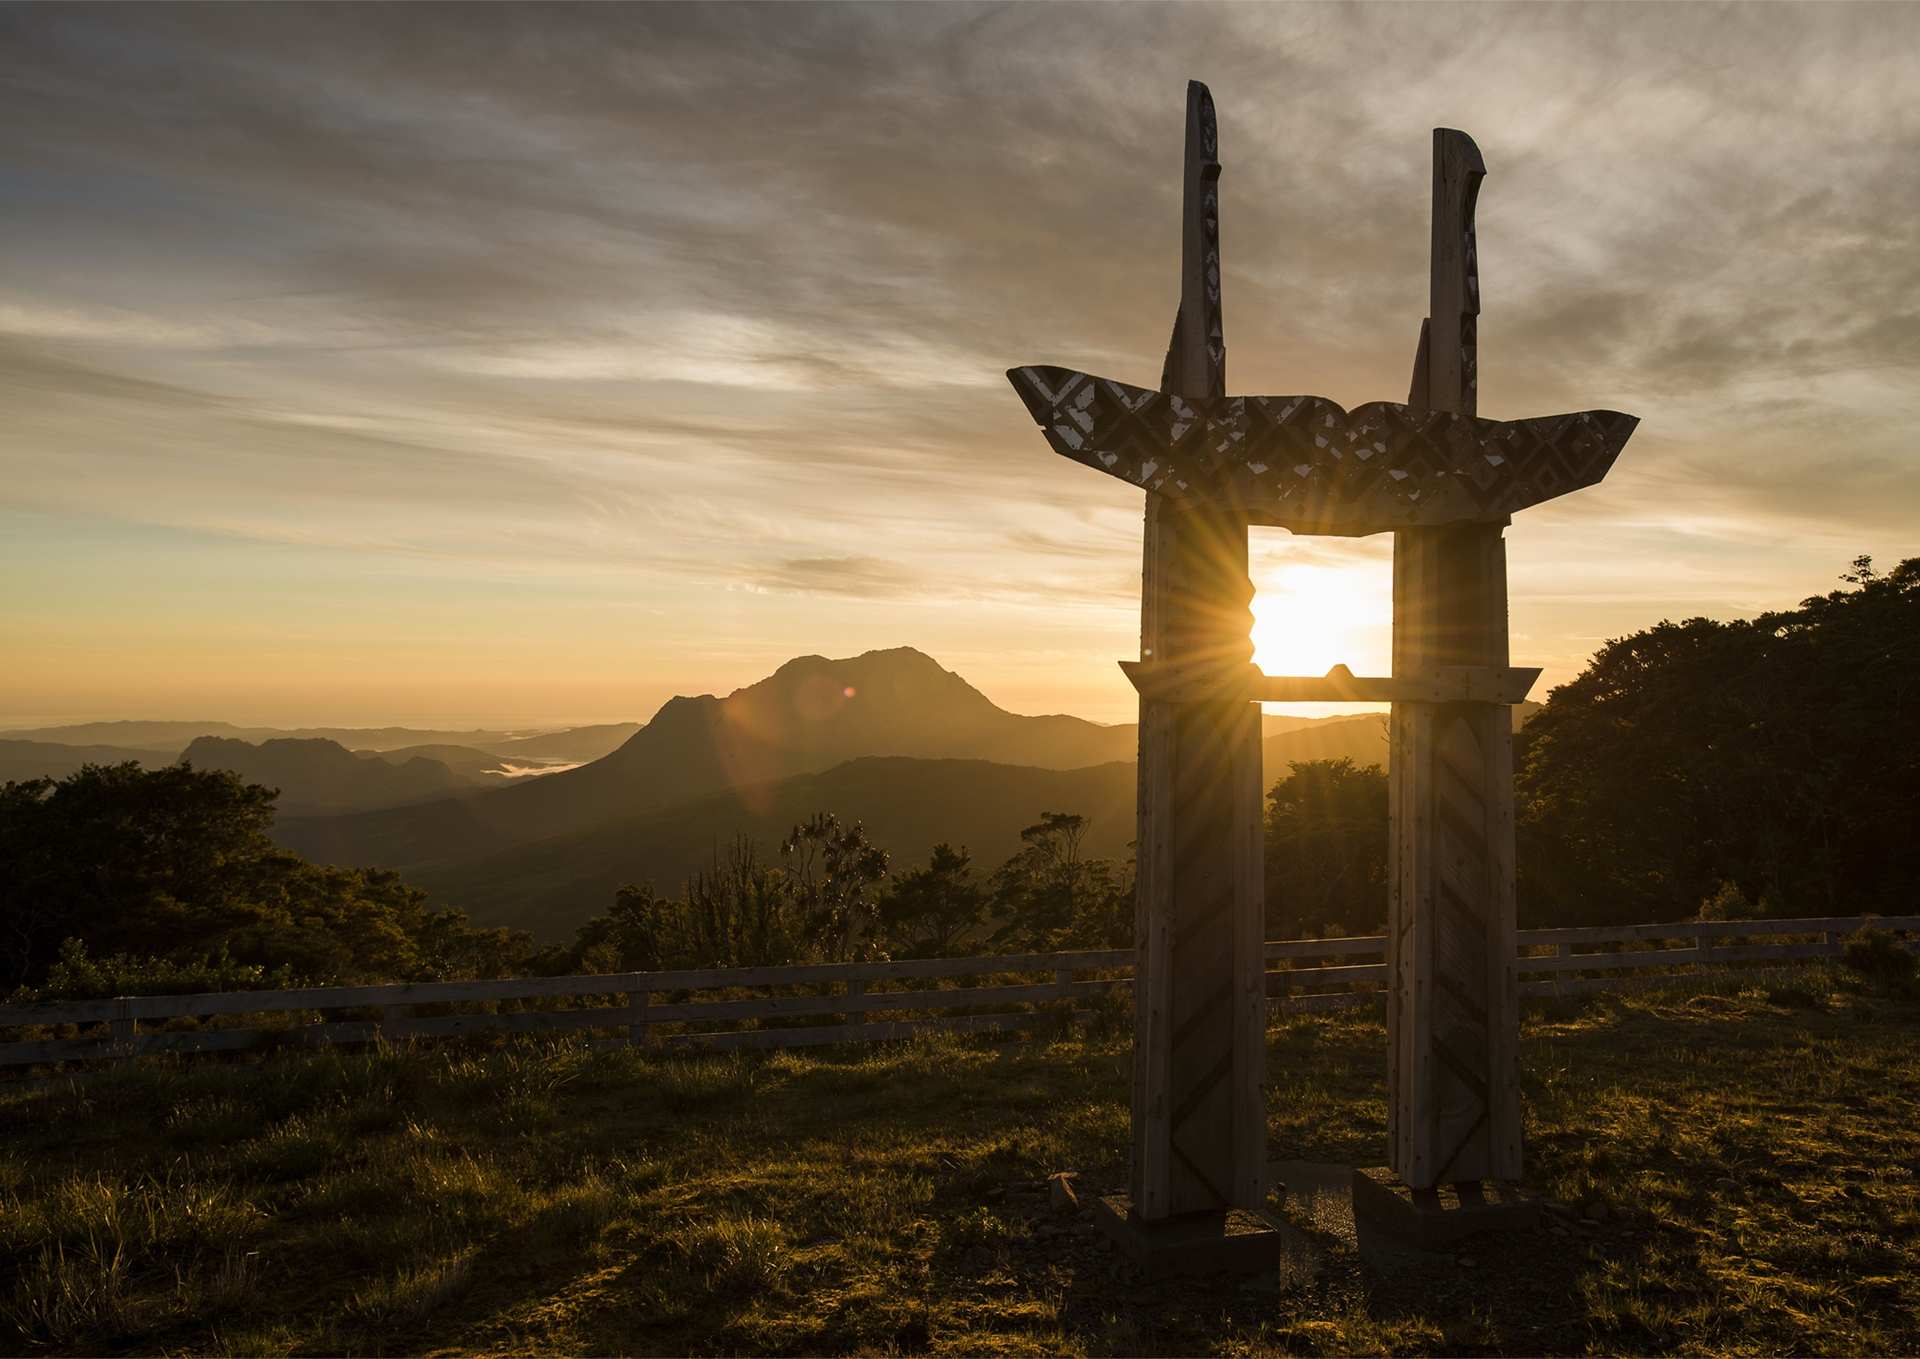 Sunrise at Maunga Hikurangi